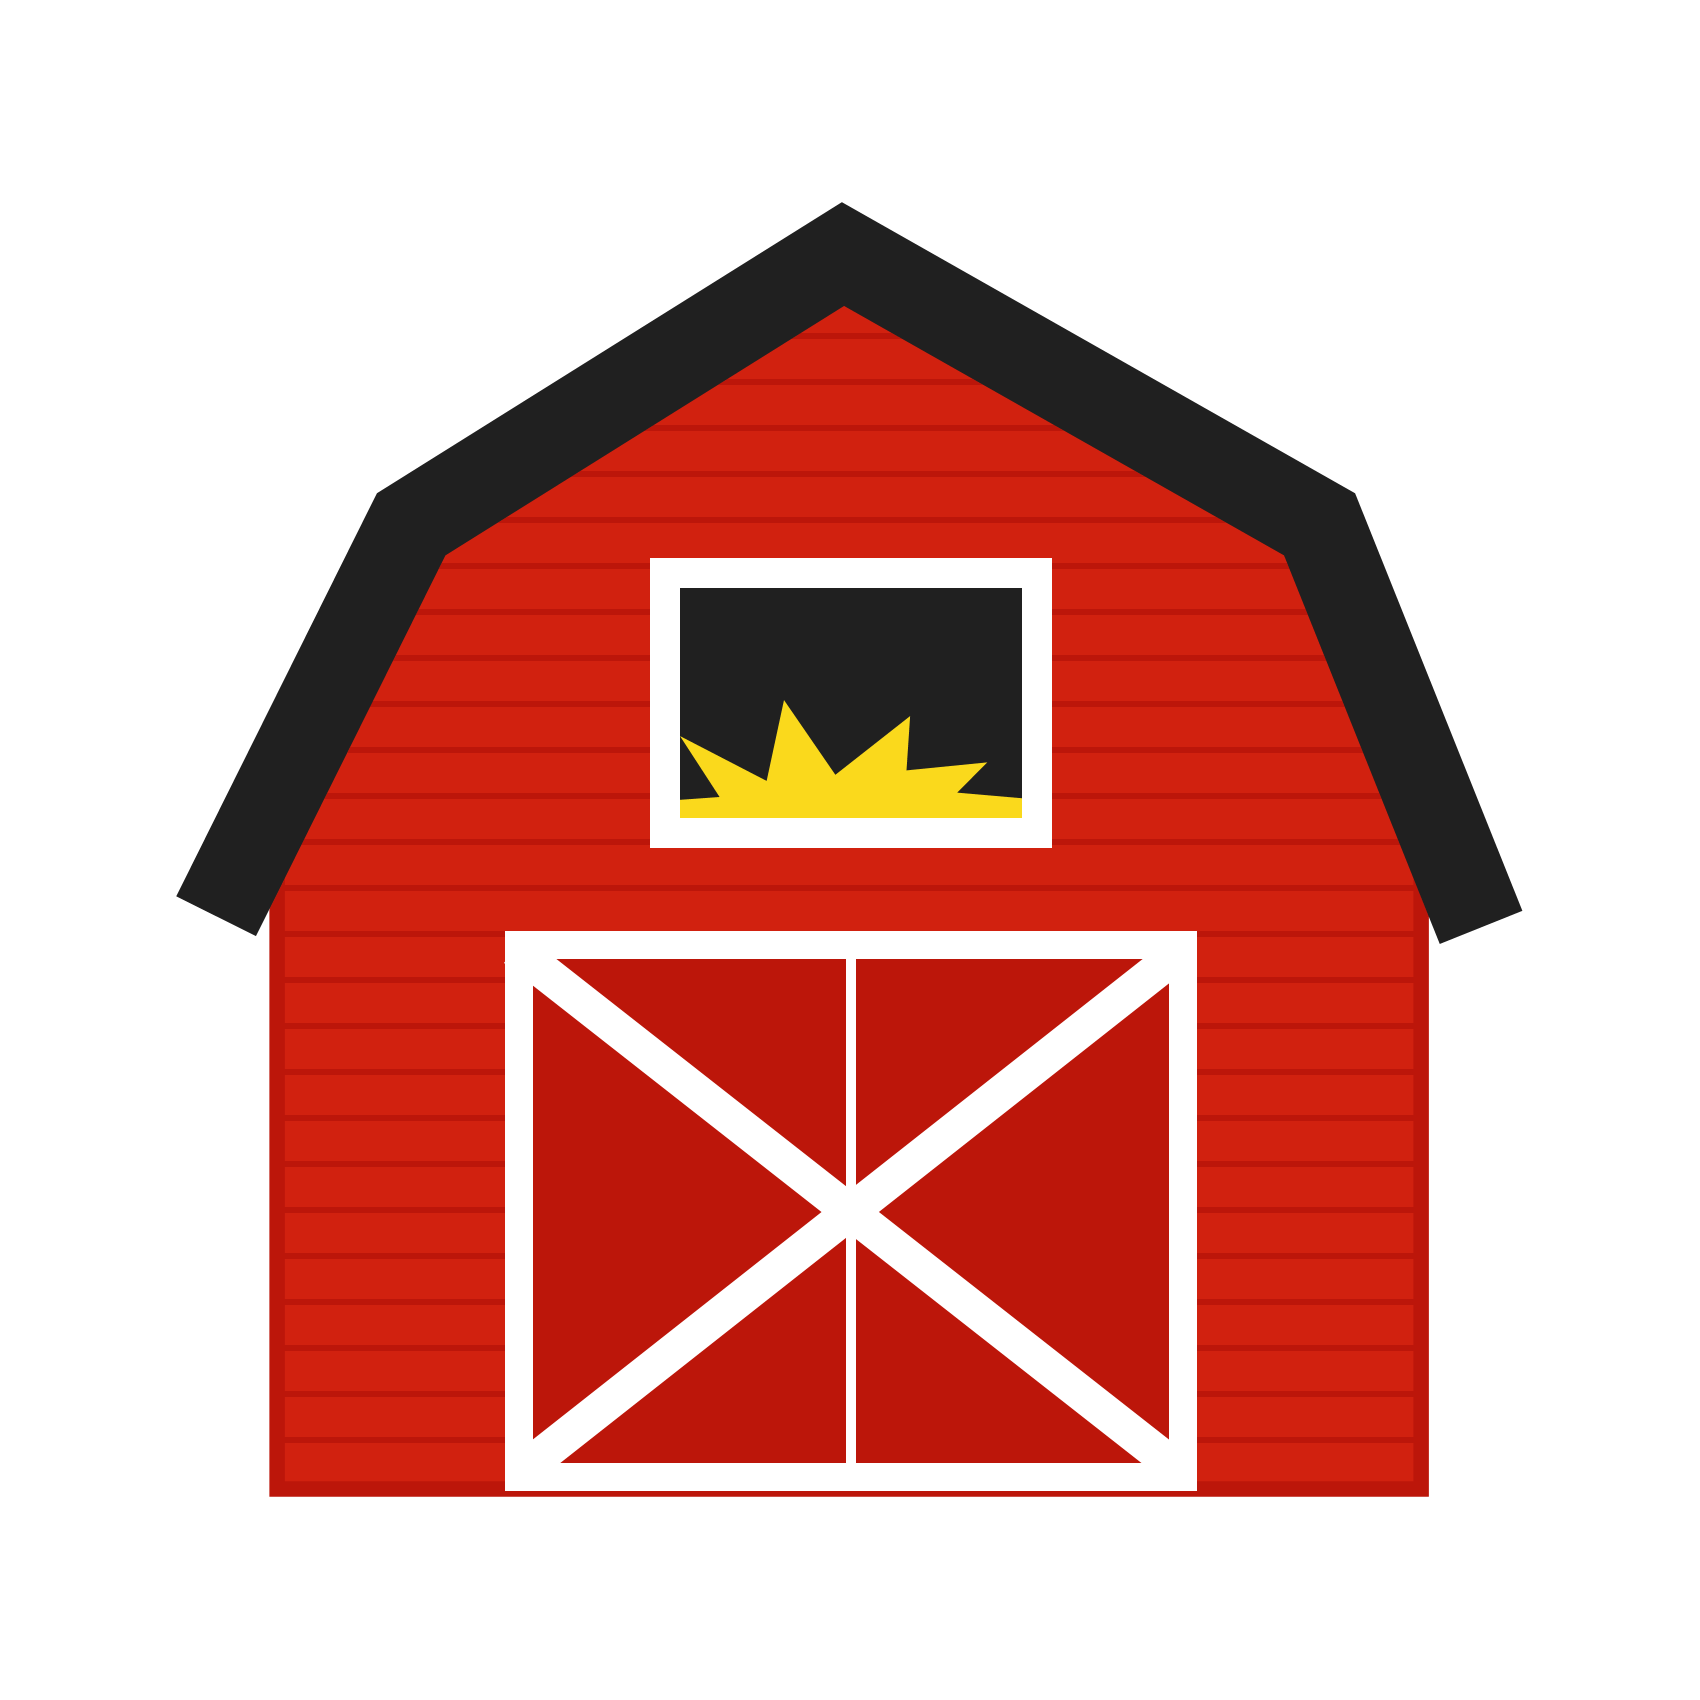 hight resolution of barn clipart